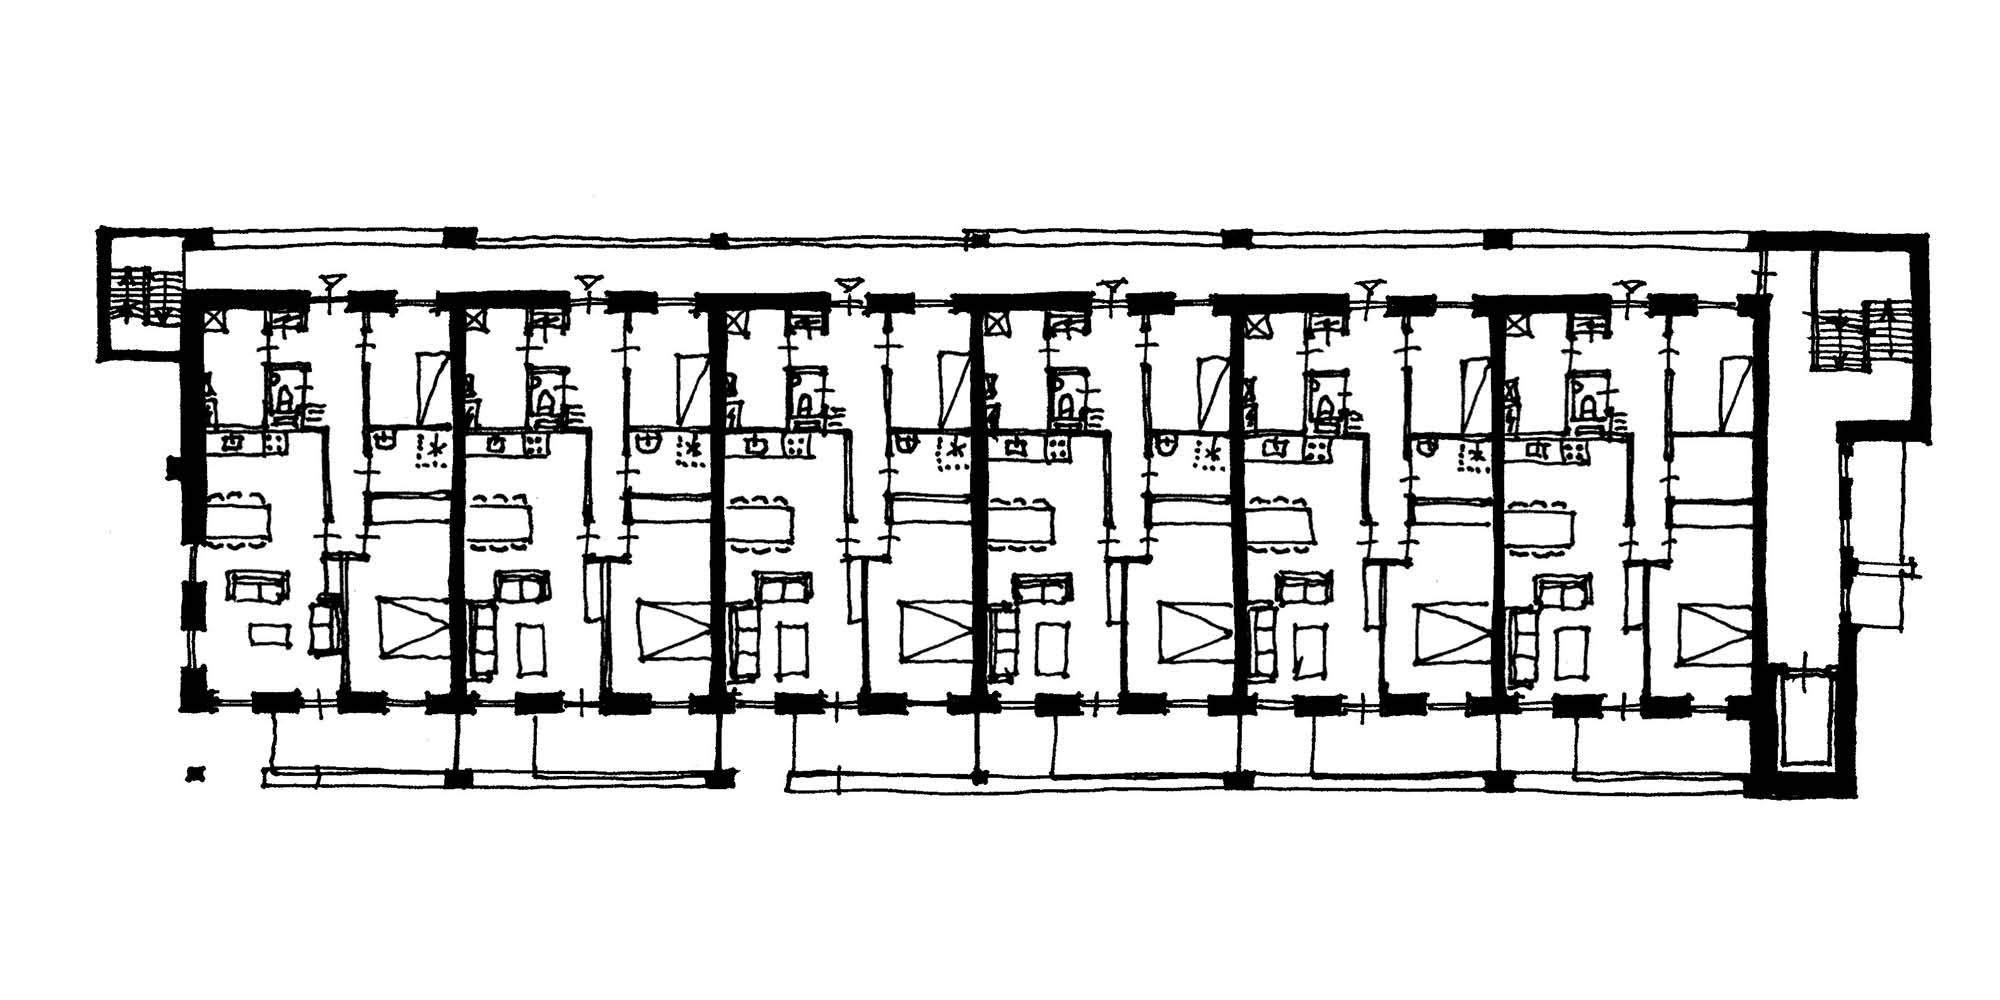 240-Stakenberg10